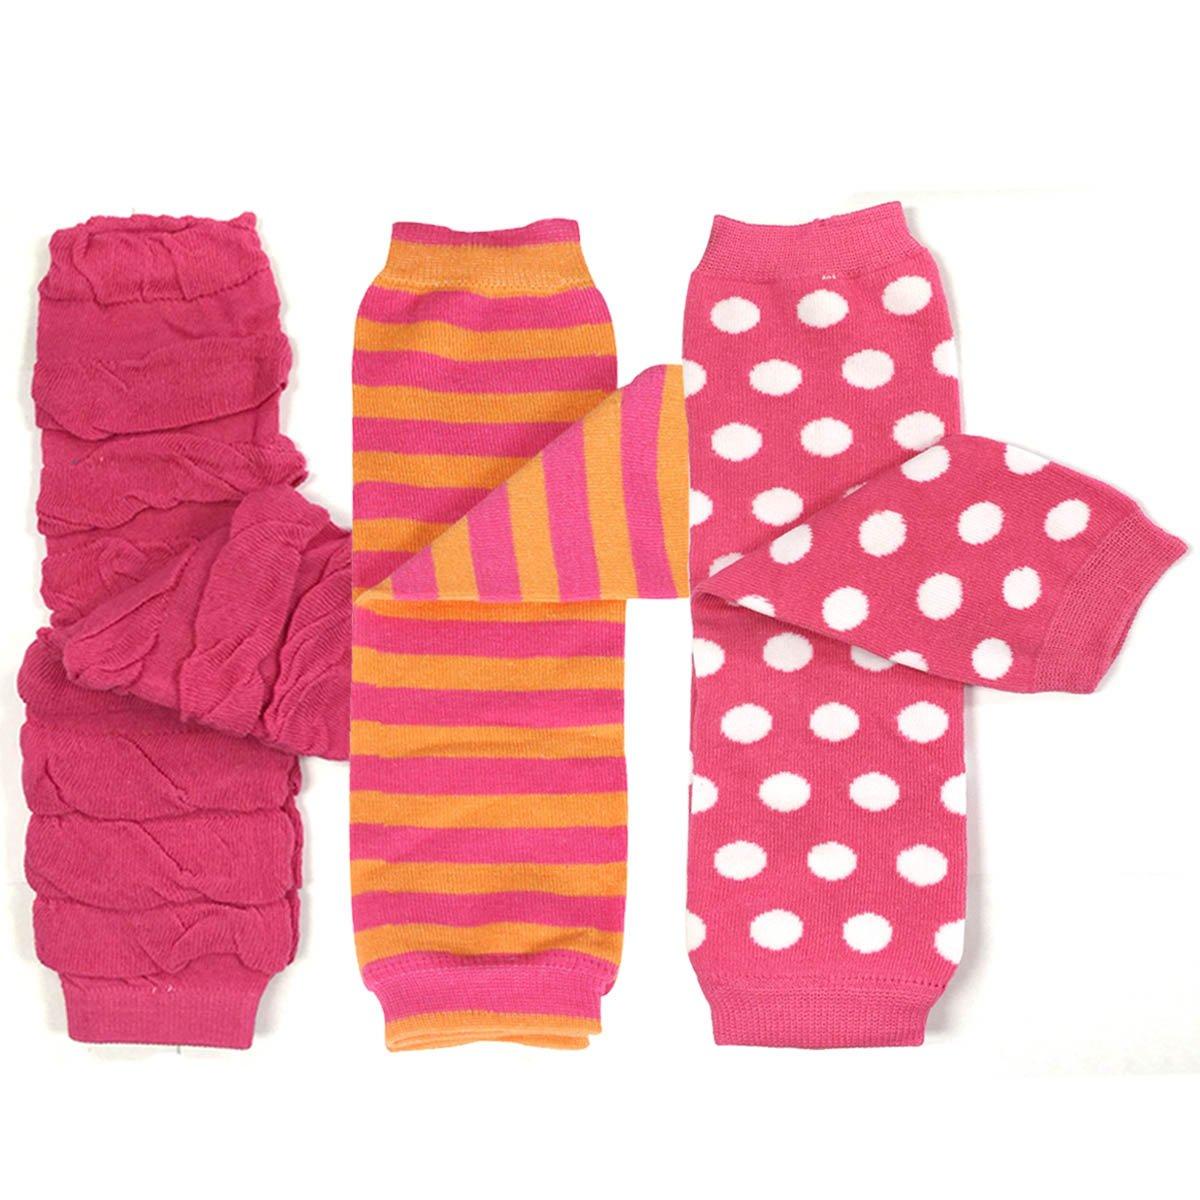 Bowbear Baby 3-Pair Leg Warmers